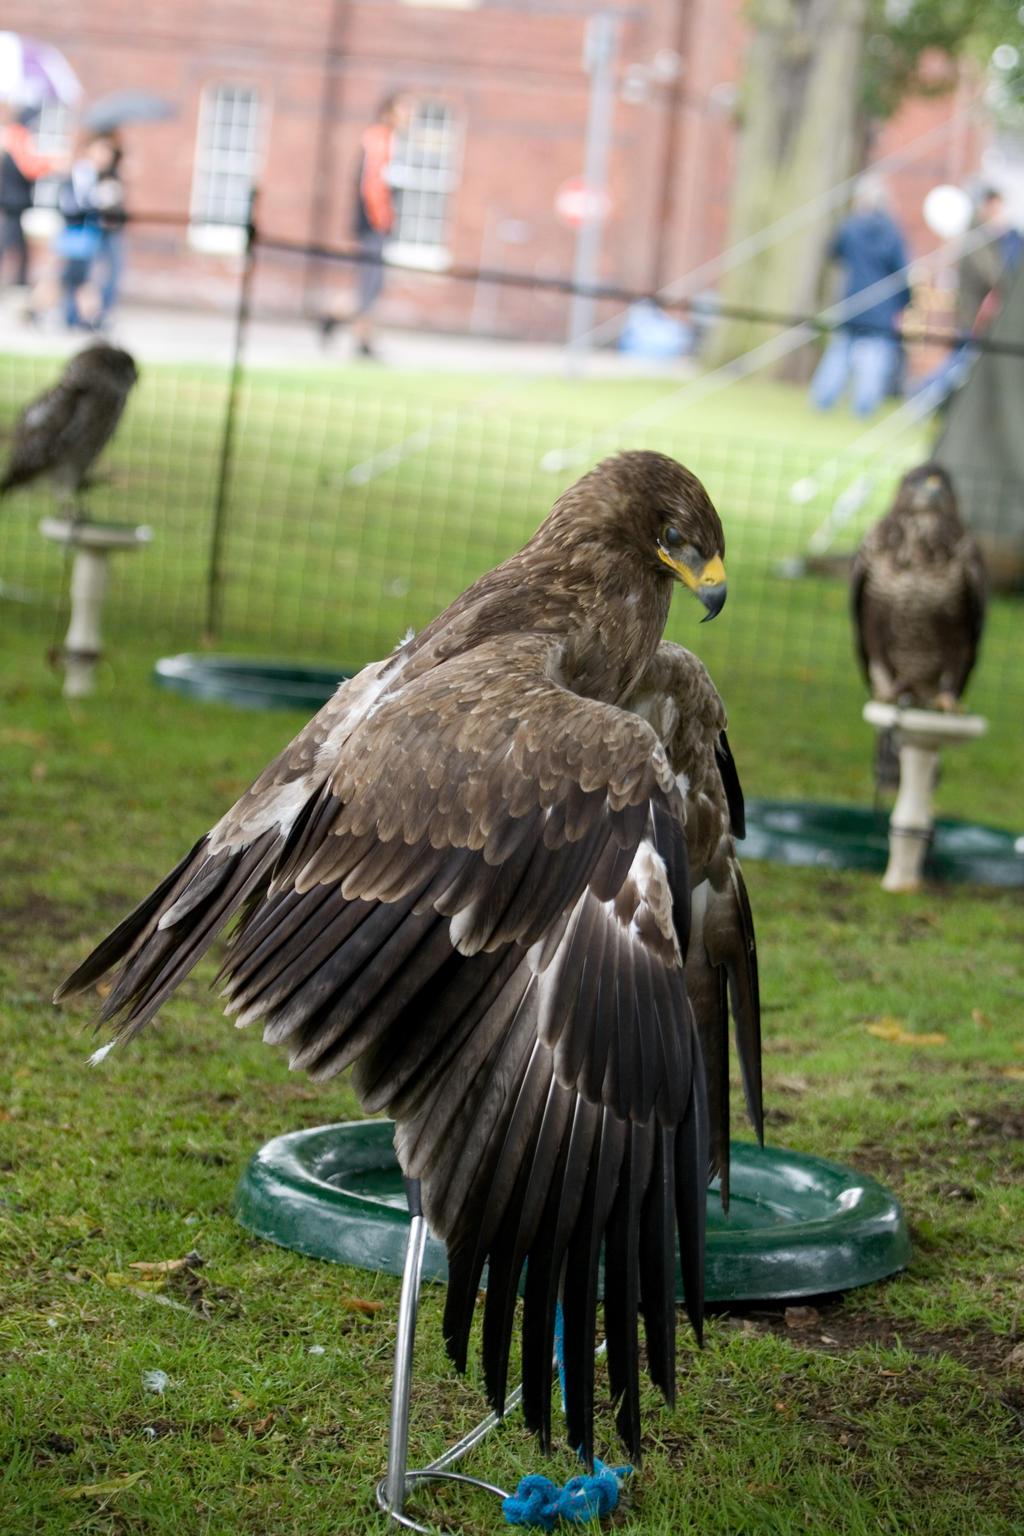 Bird of prey 6 by Random-Acts-Stock